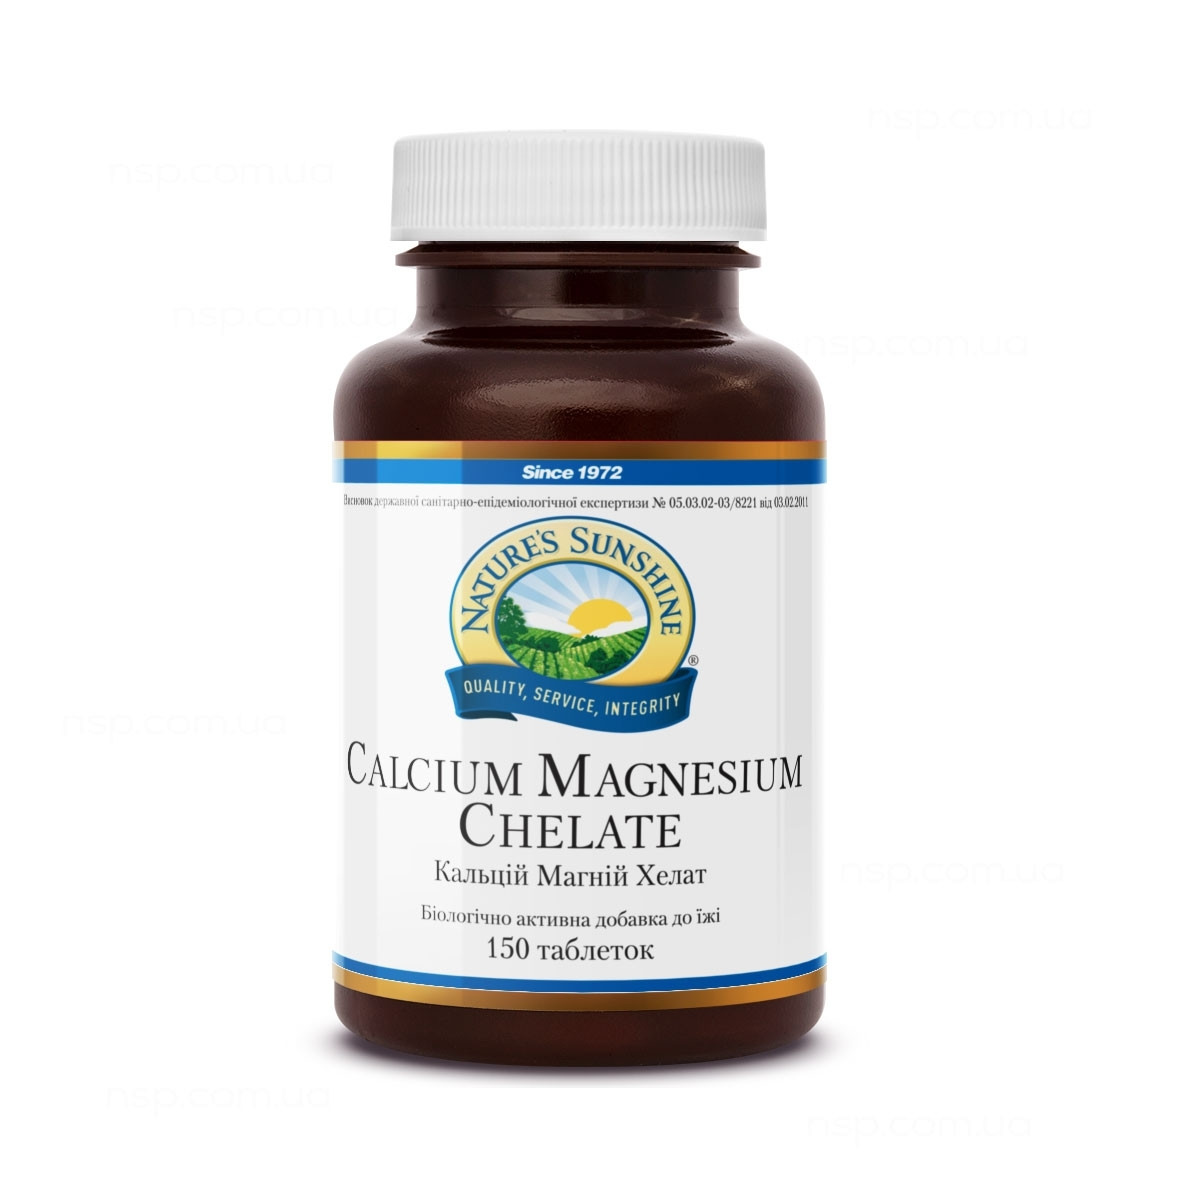 Кальций Магний Хелат Calcium Magnesium Chelate